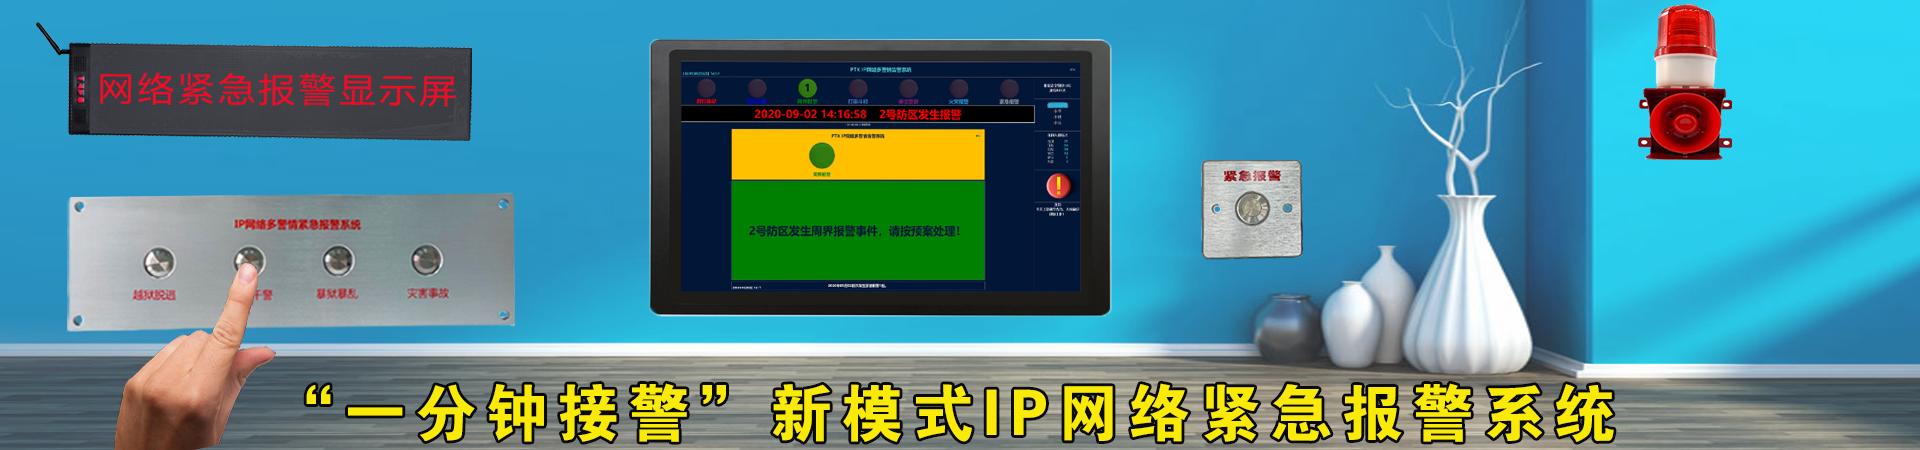 IP网络LED语音播报电子屏